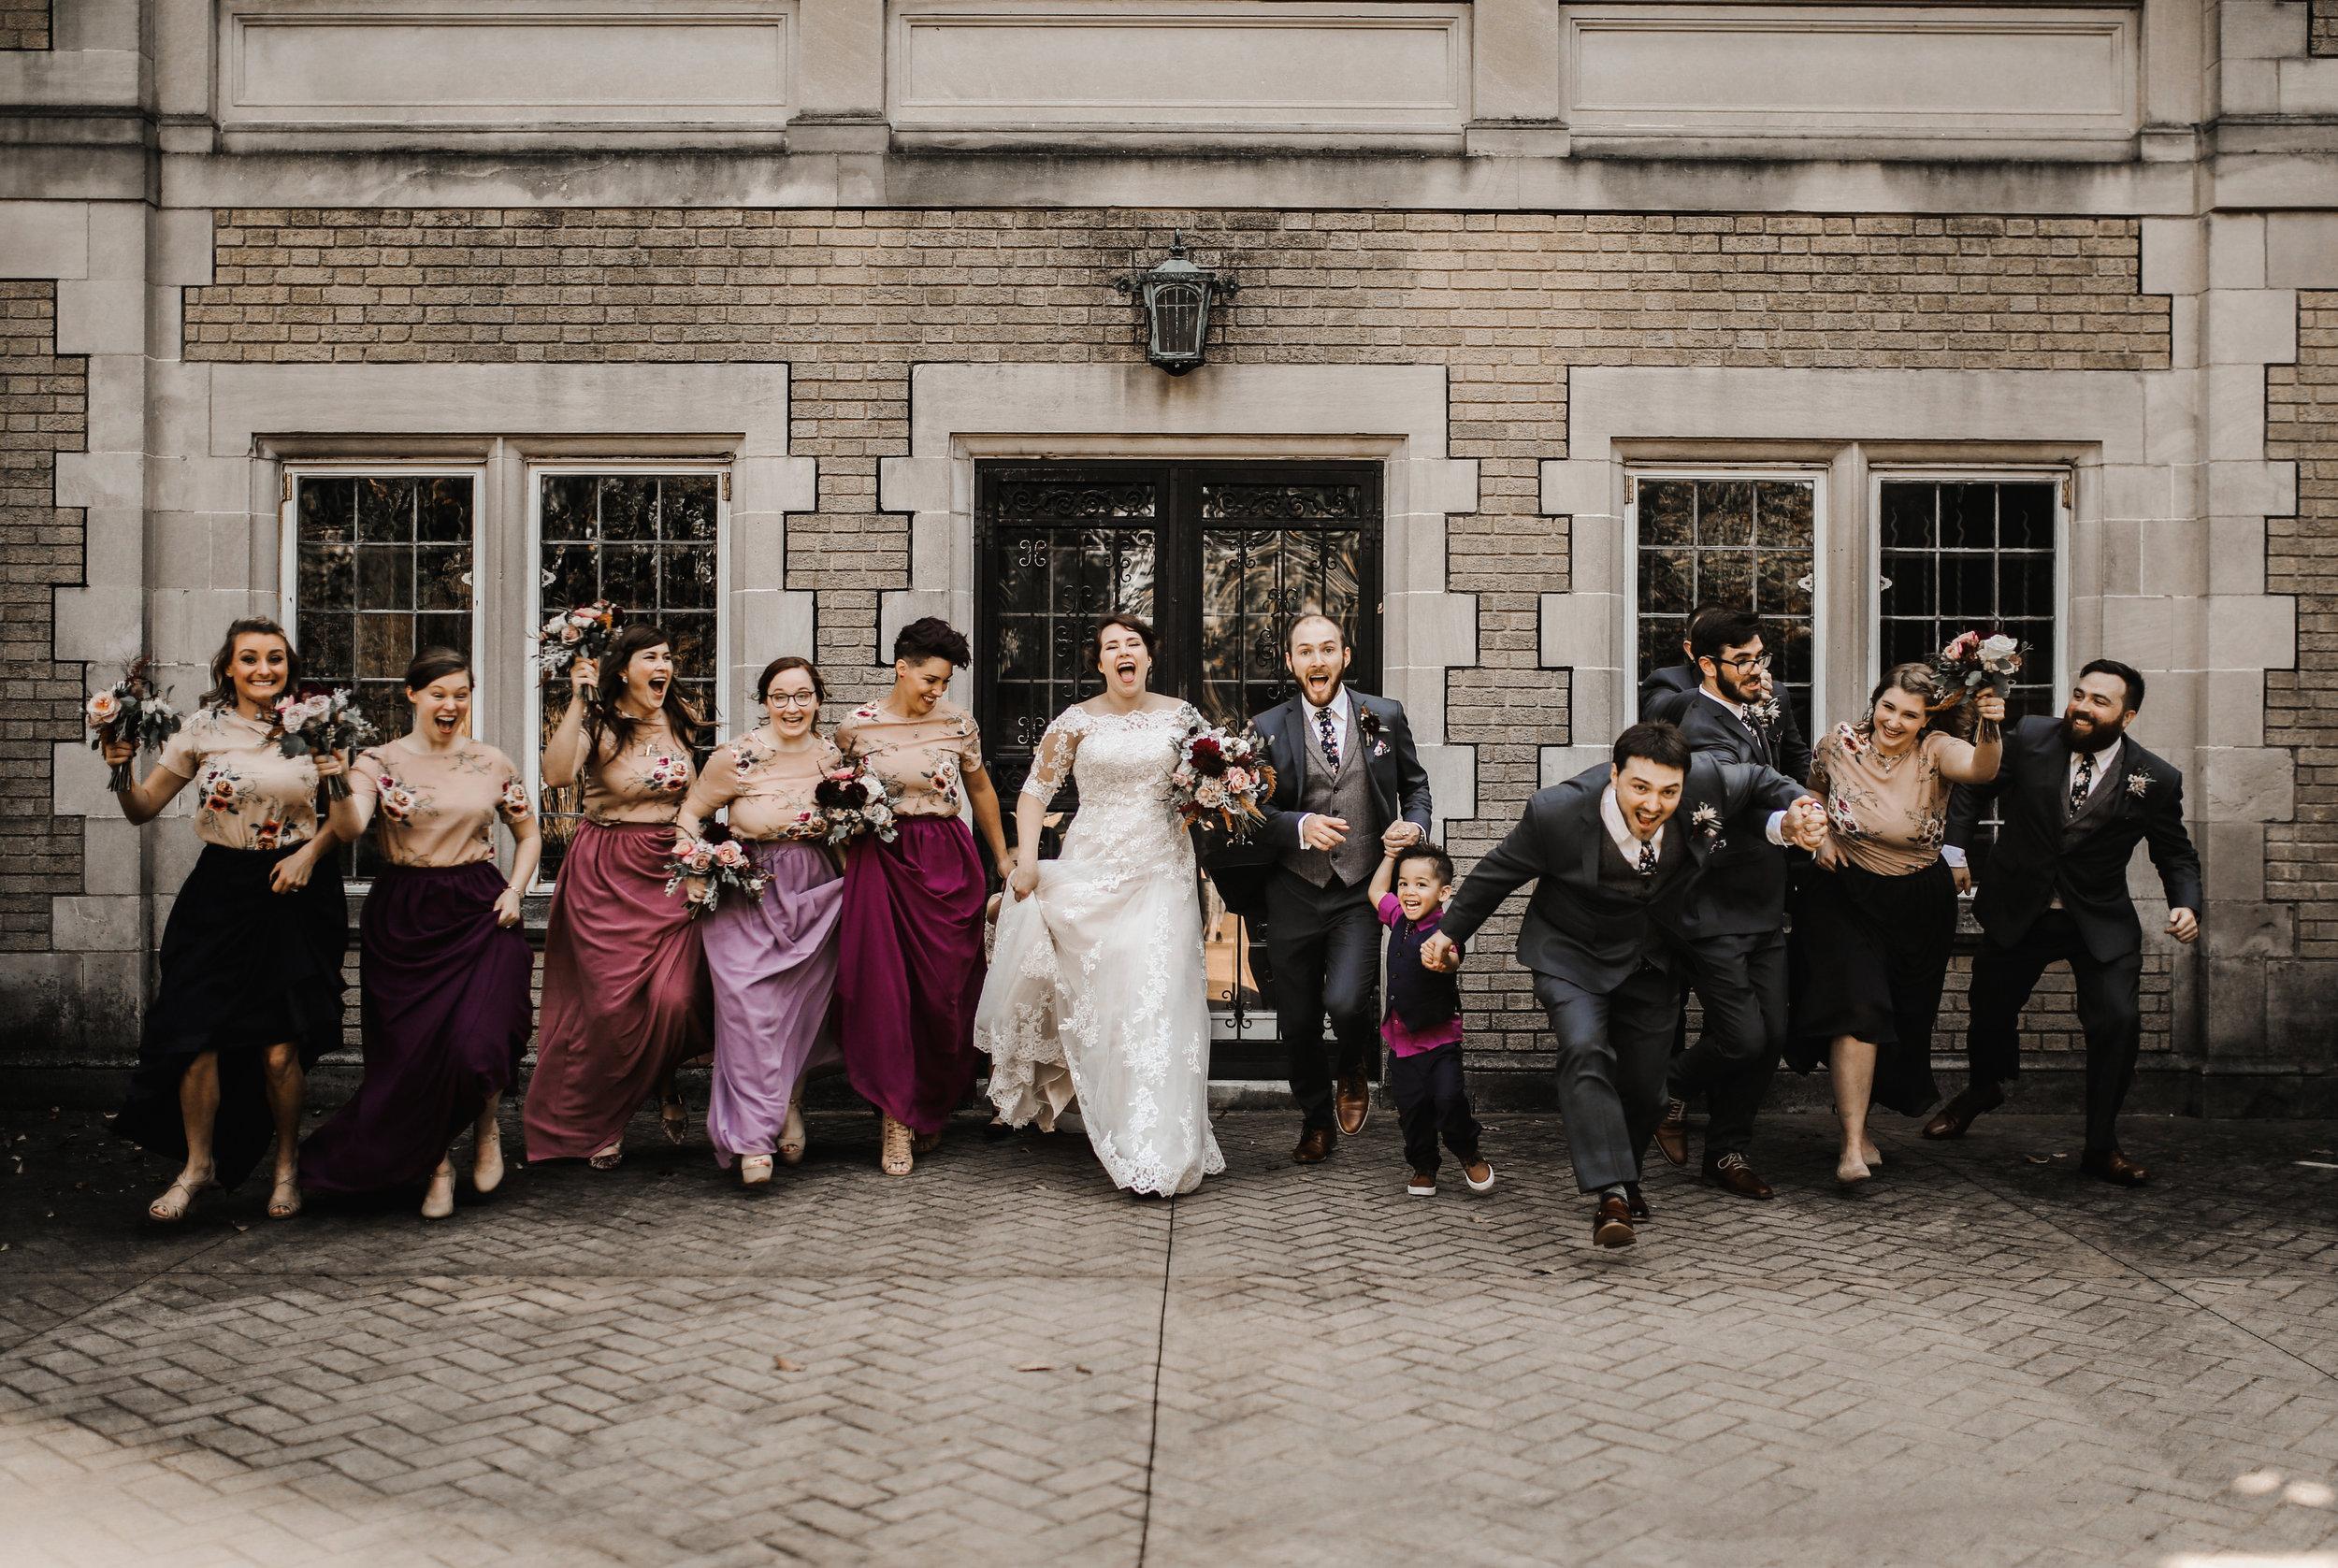 LDP_McNeiveWedding_WeddingParty_080.JPG